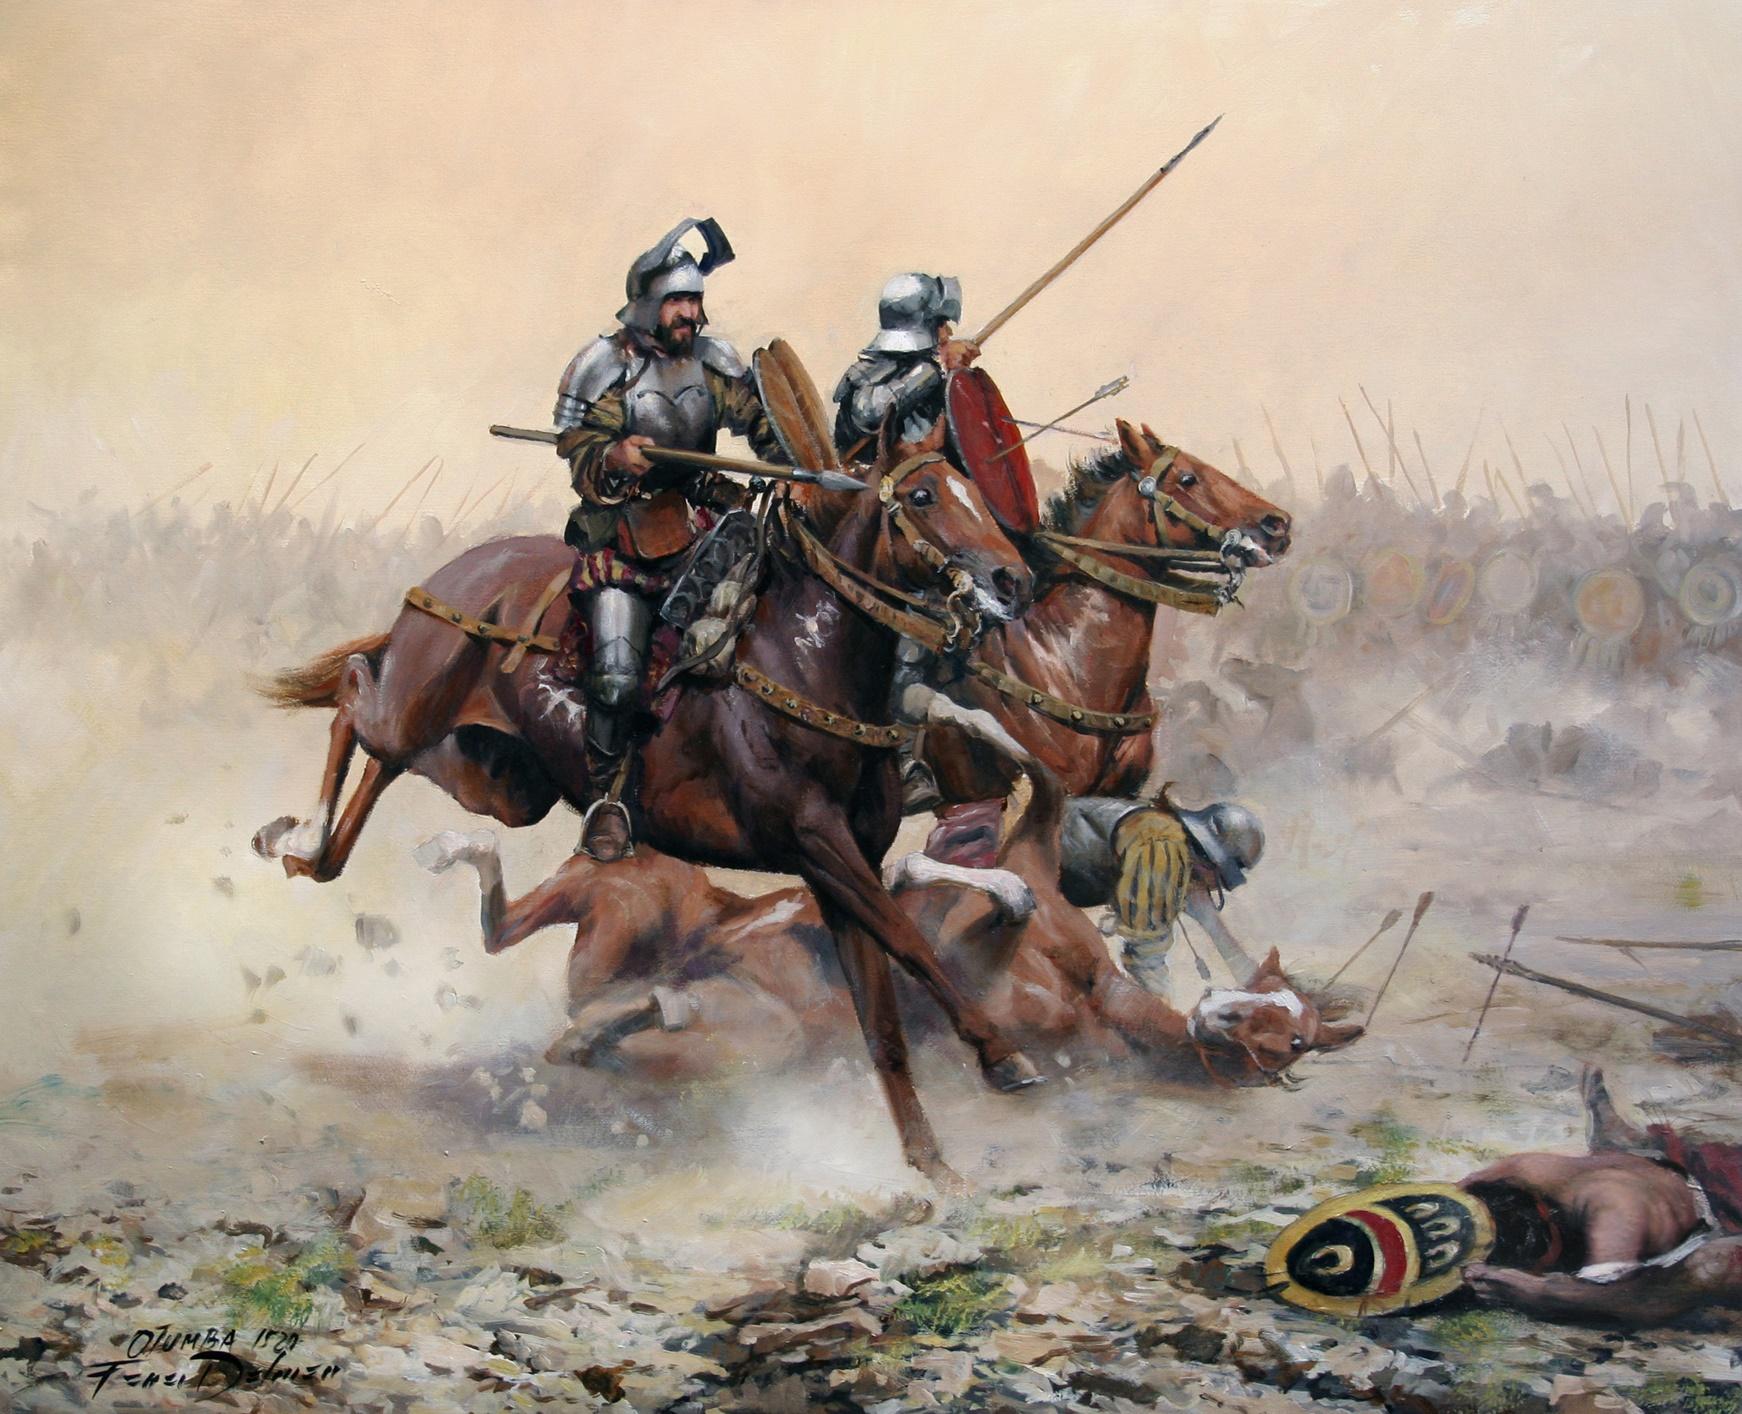 Diario semanal de desarrollo de Bannerlord 10: BATTANIA - Página 2 Otumba